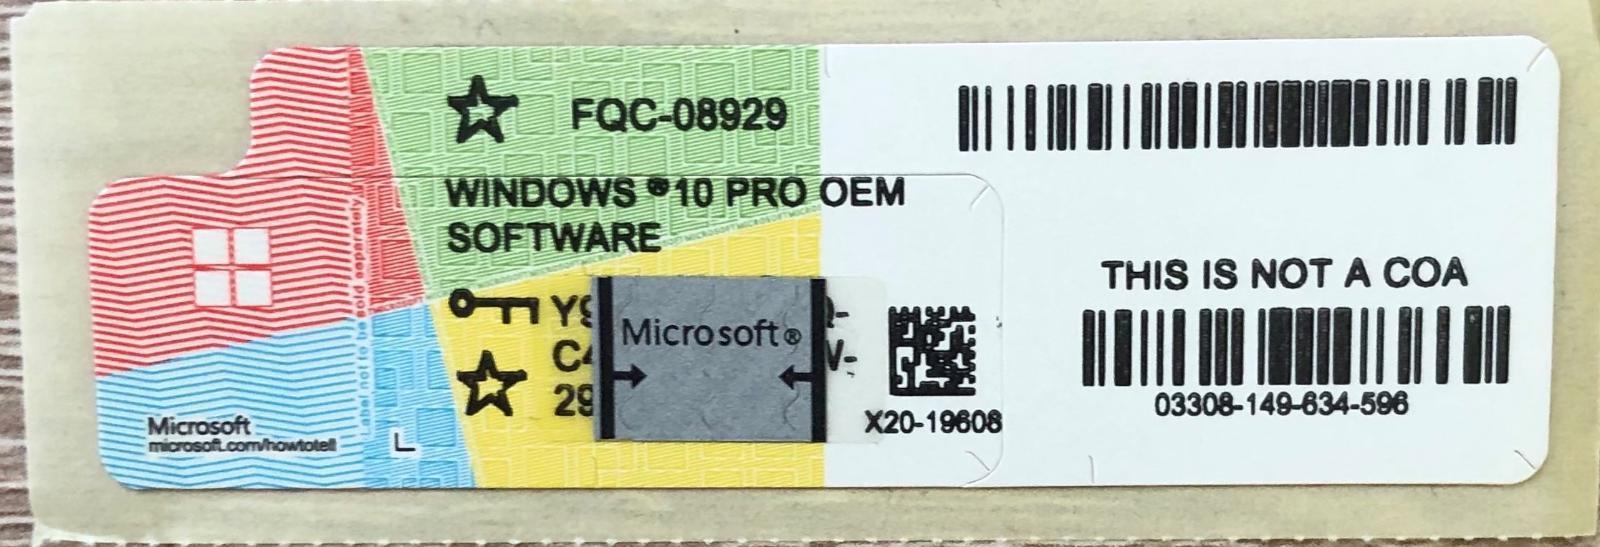 Windows 10 Pro OEM (fyzická licence - COA) + Faktura - Software